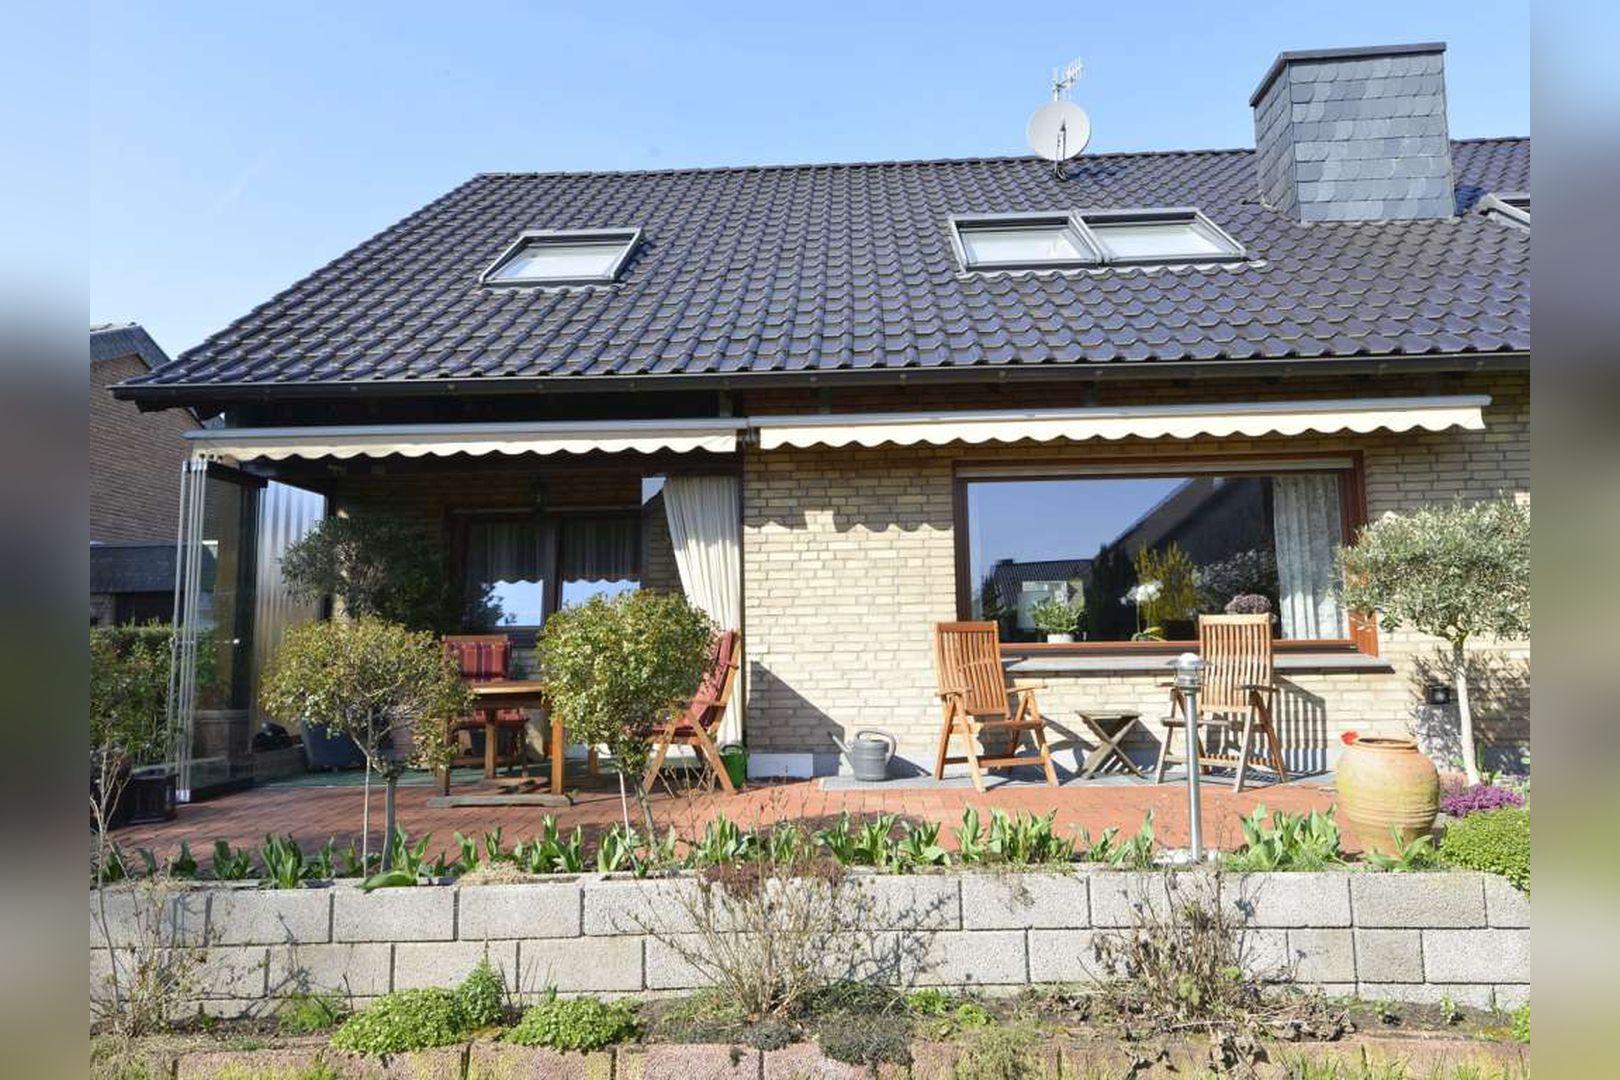 Immobilie Nr.0254 - Doppelhaushälfte rechtsbündig mit Garage & Carport  - Bild 4.jpg